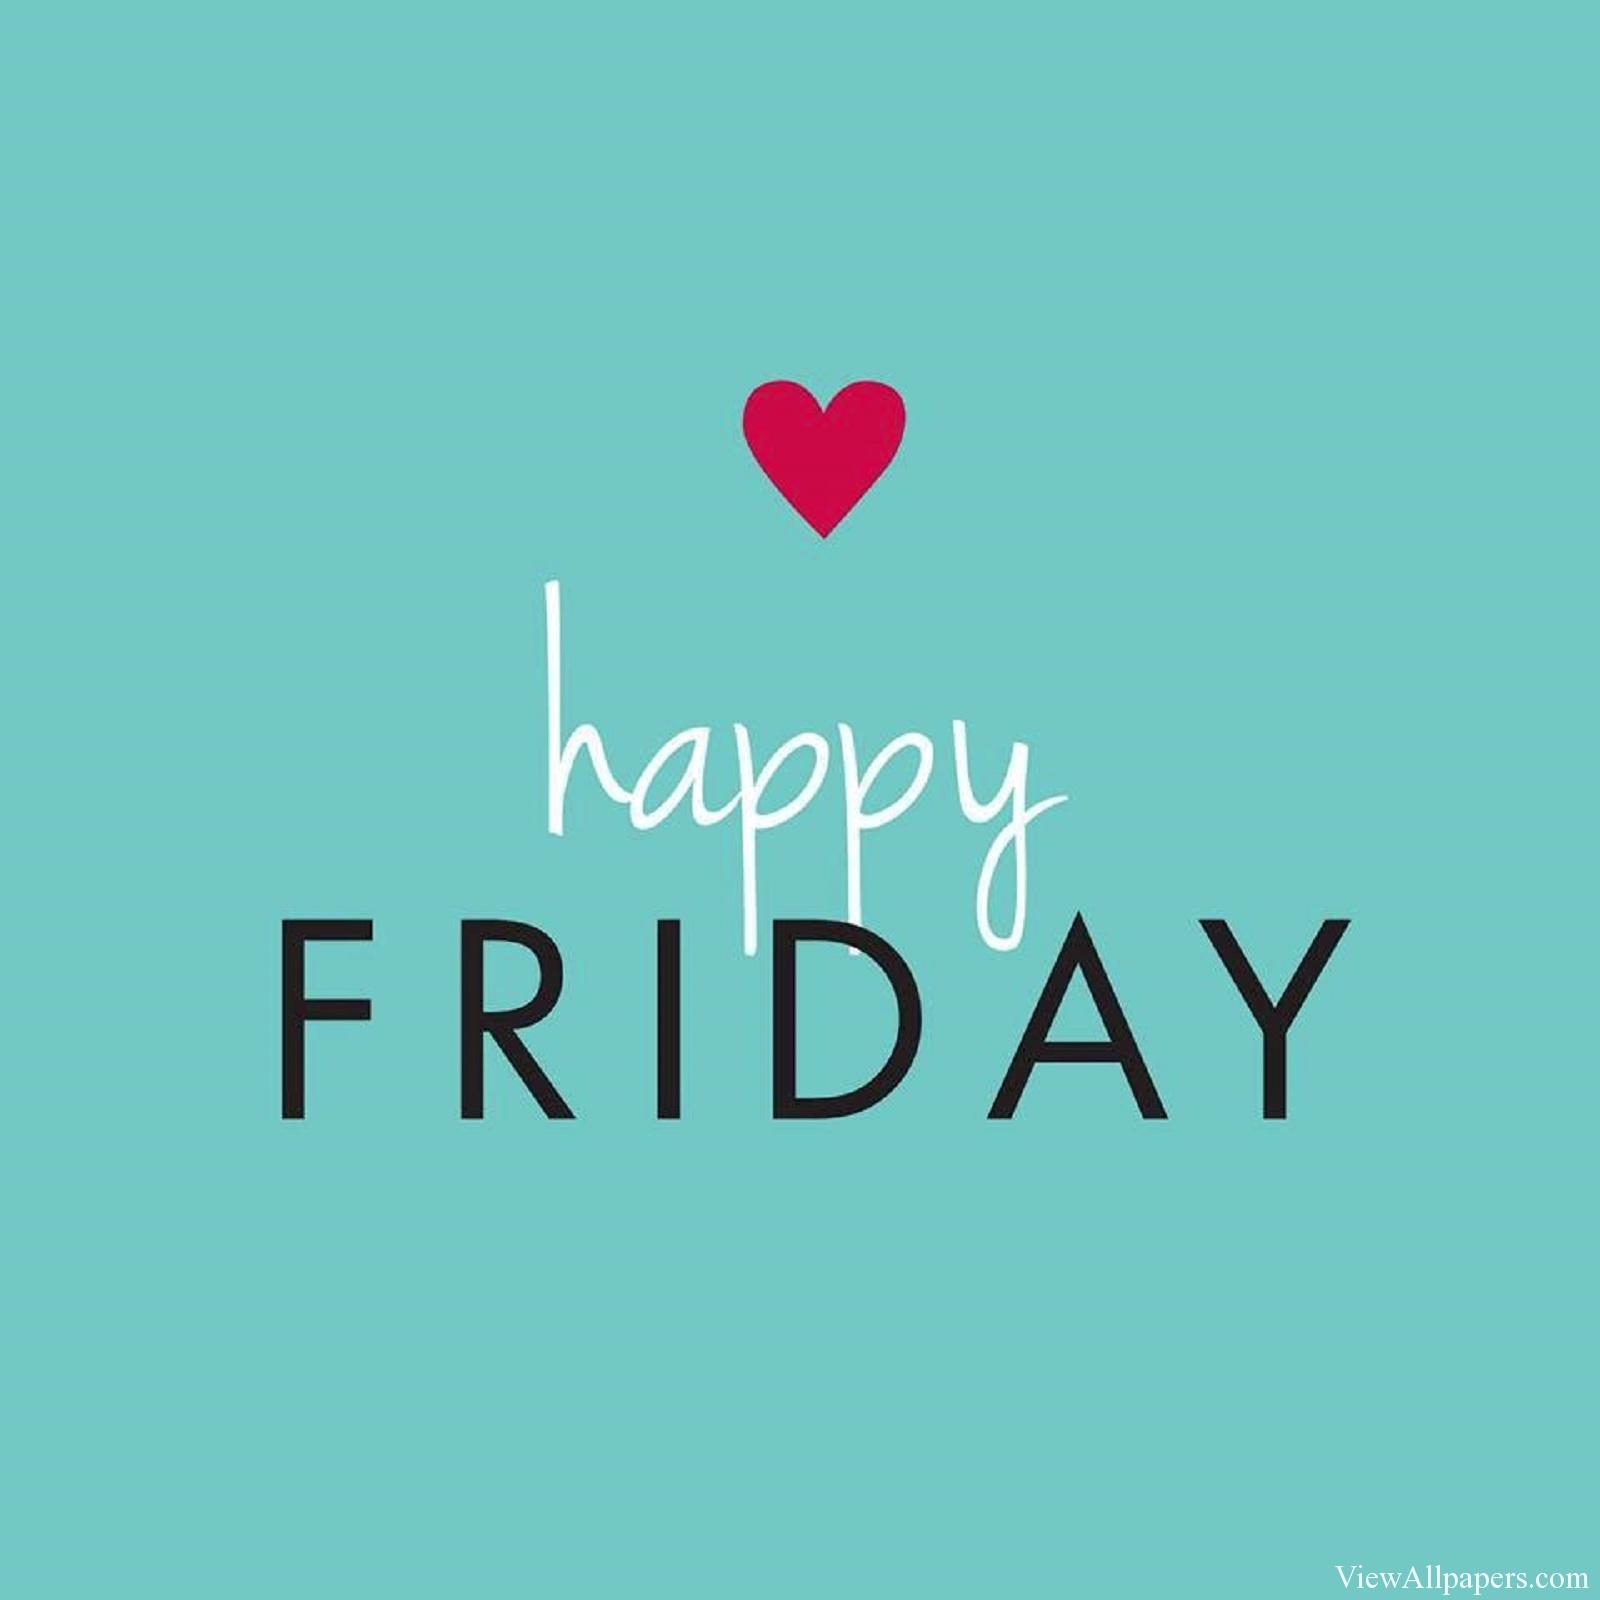 47+] Free Happy Friday Wallpaper on WallpaperSafari